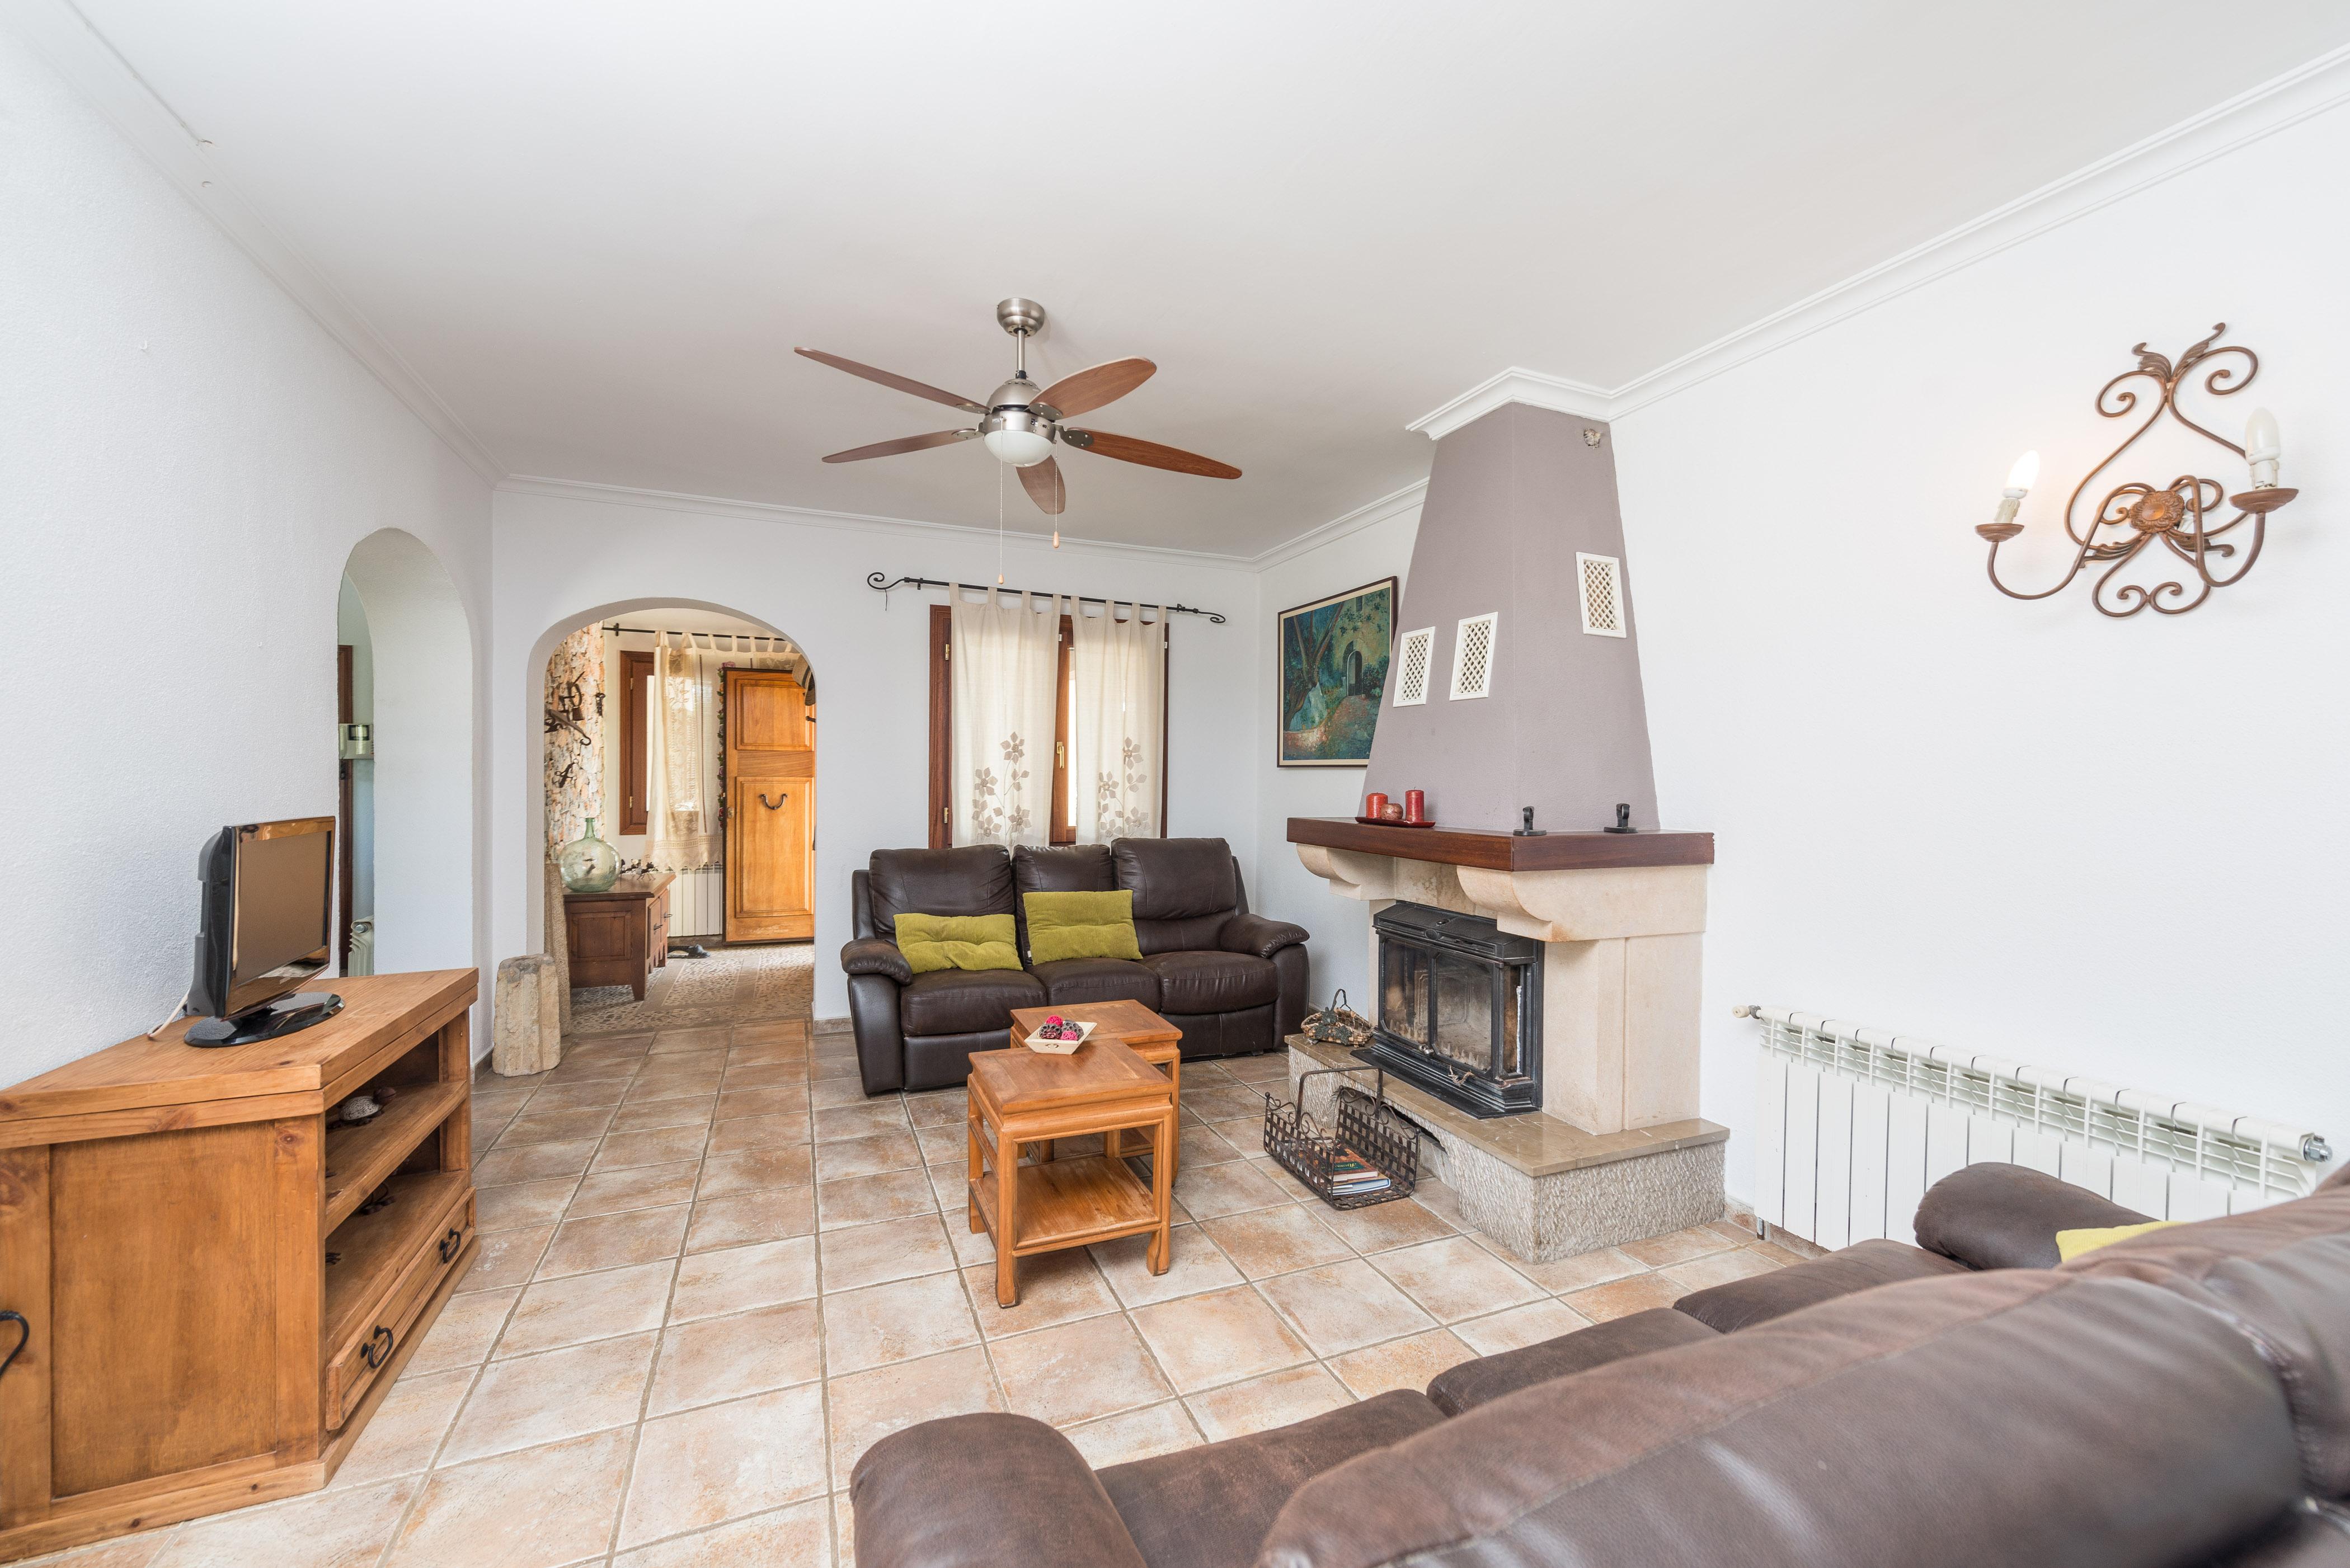 Ferienhaus SA CORBAIA (2020559), Arta, Mallorca, Balearische Inseln, Spanien, Bild 14